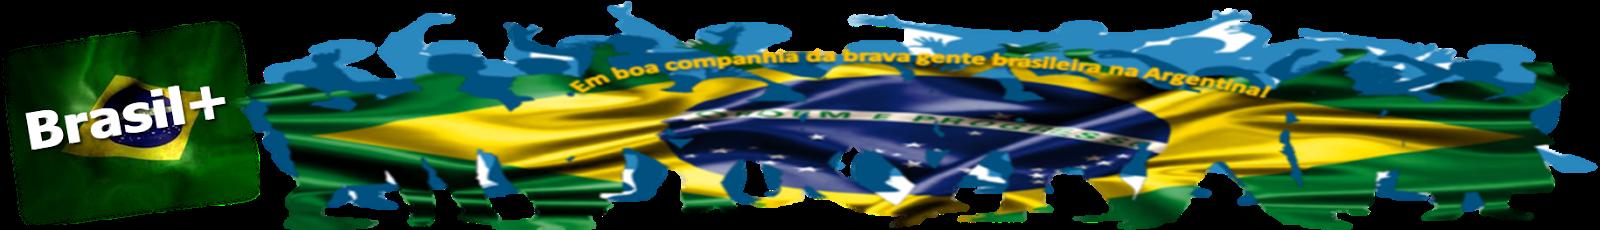 Brasil Terra Querida